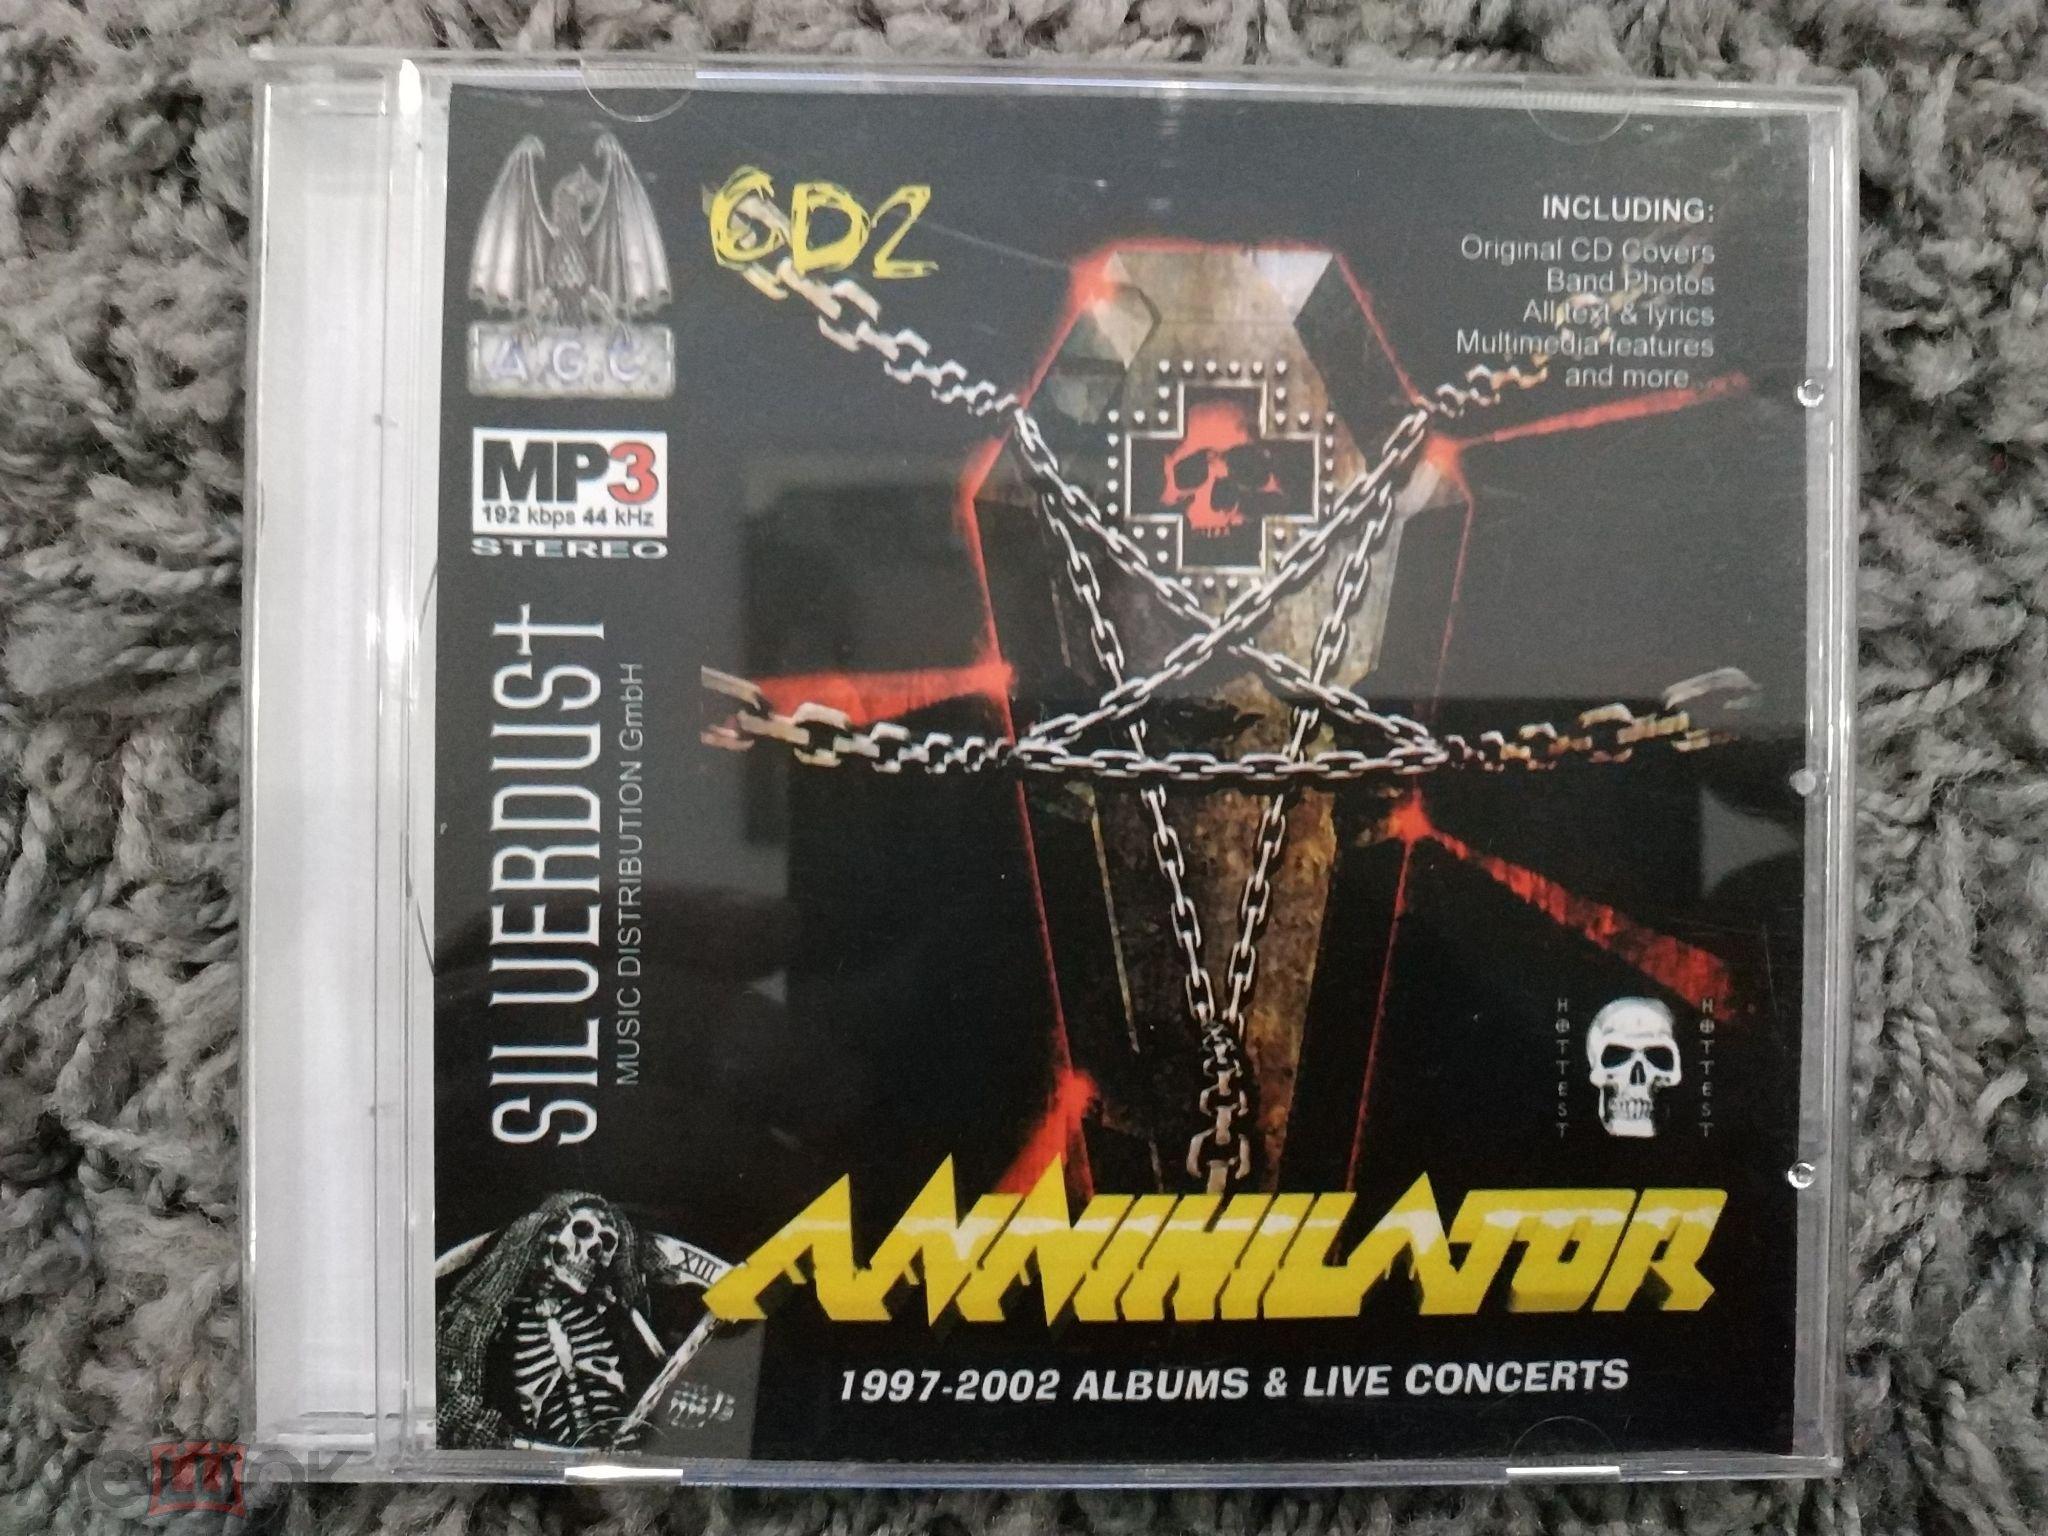 Annihilator, MP3, Комплект Из 2 CD, 12 Albums & Live